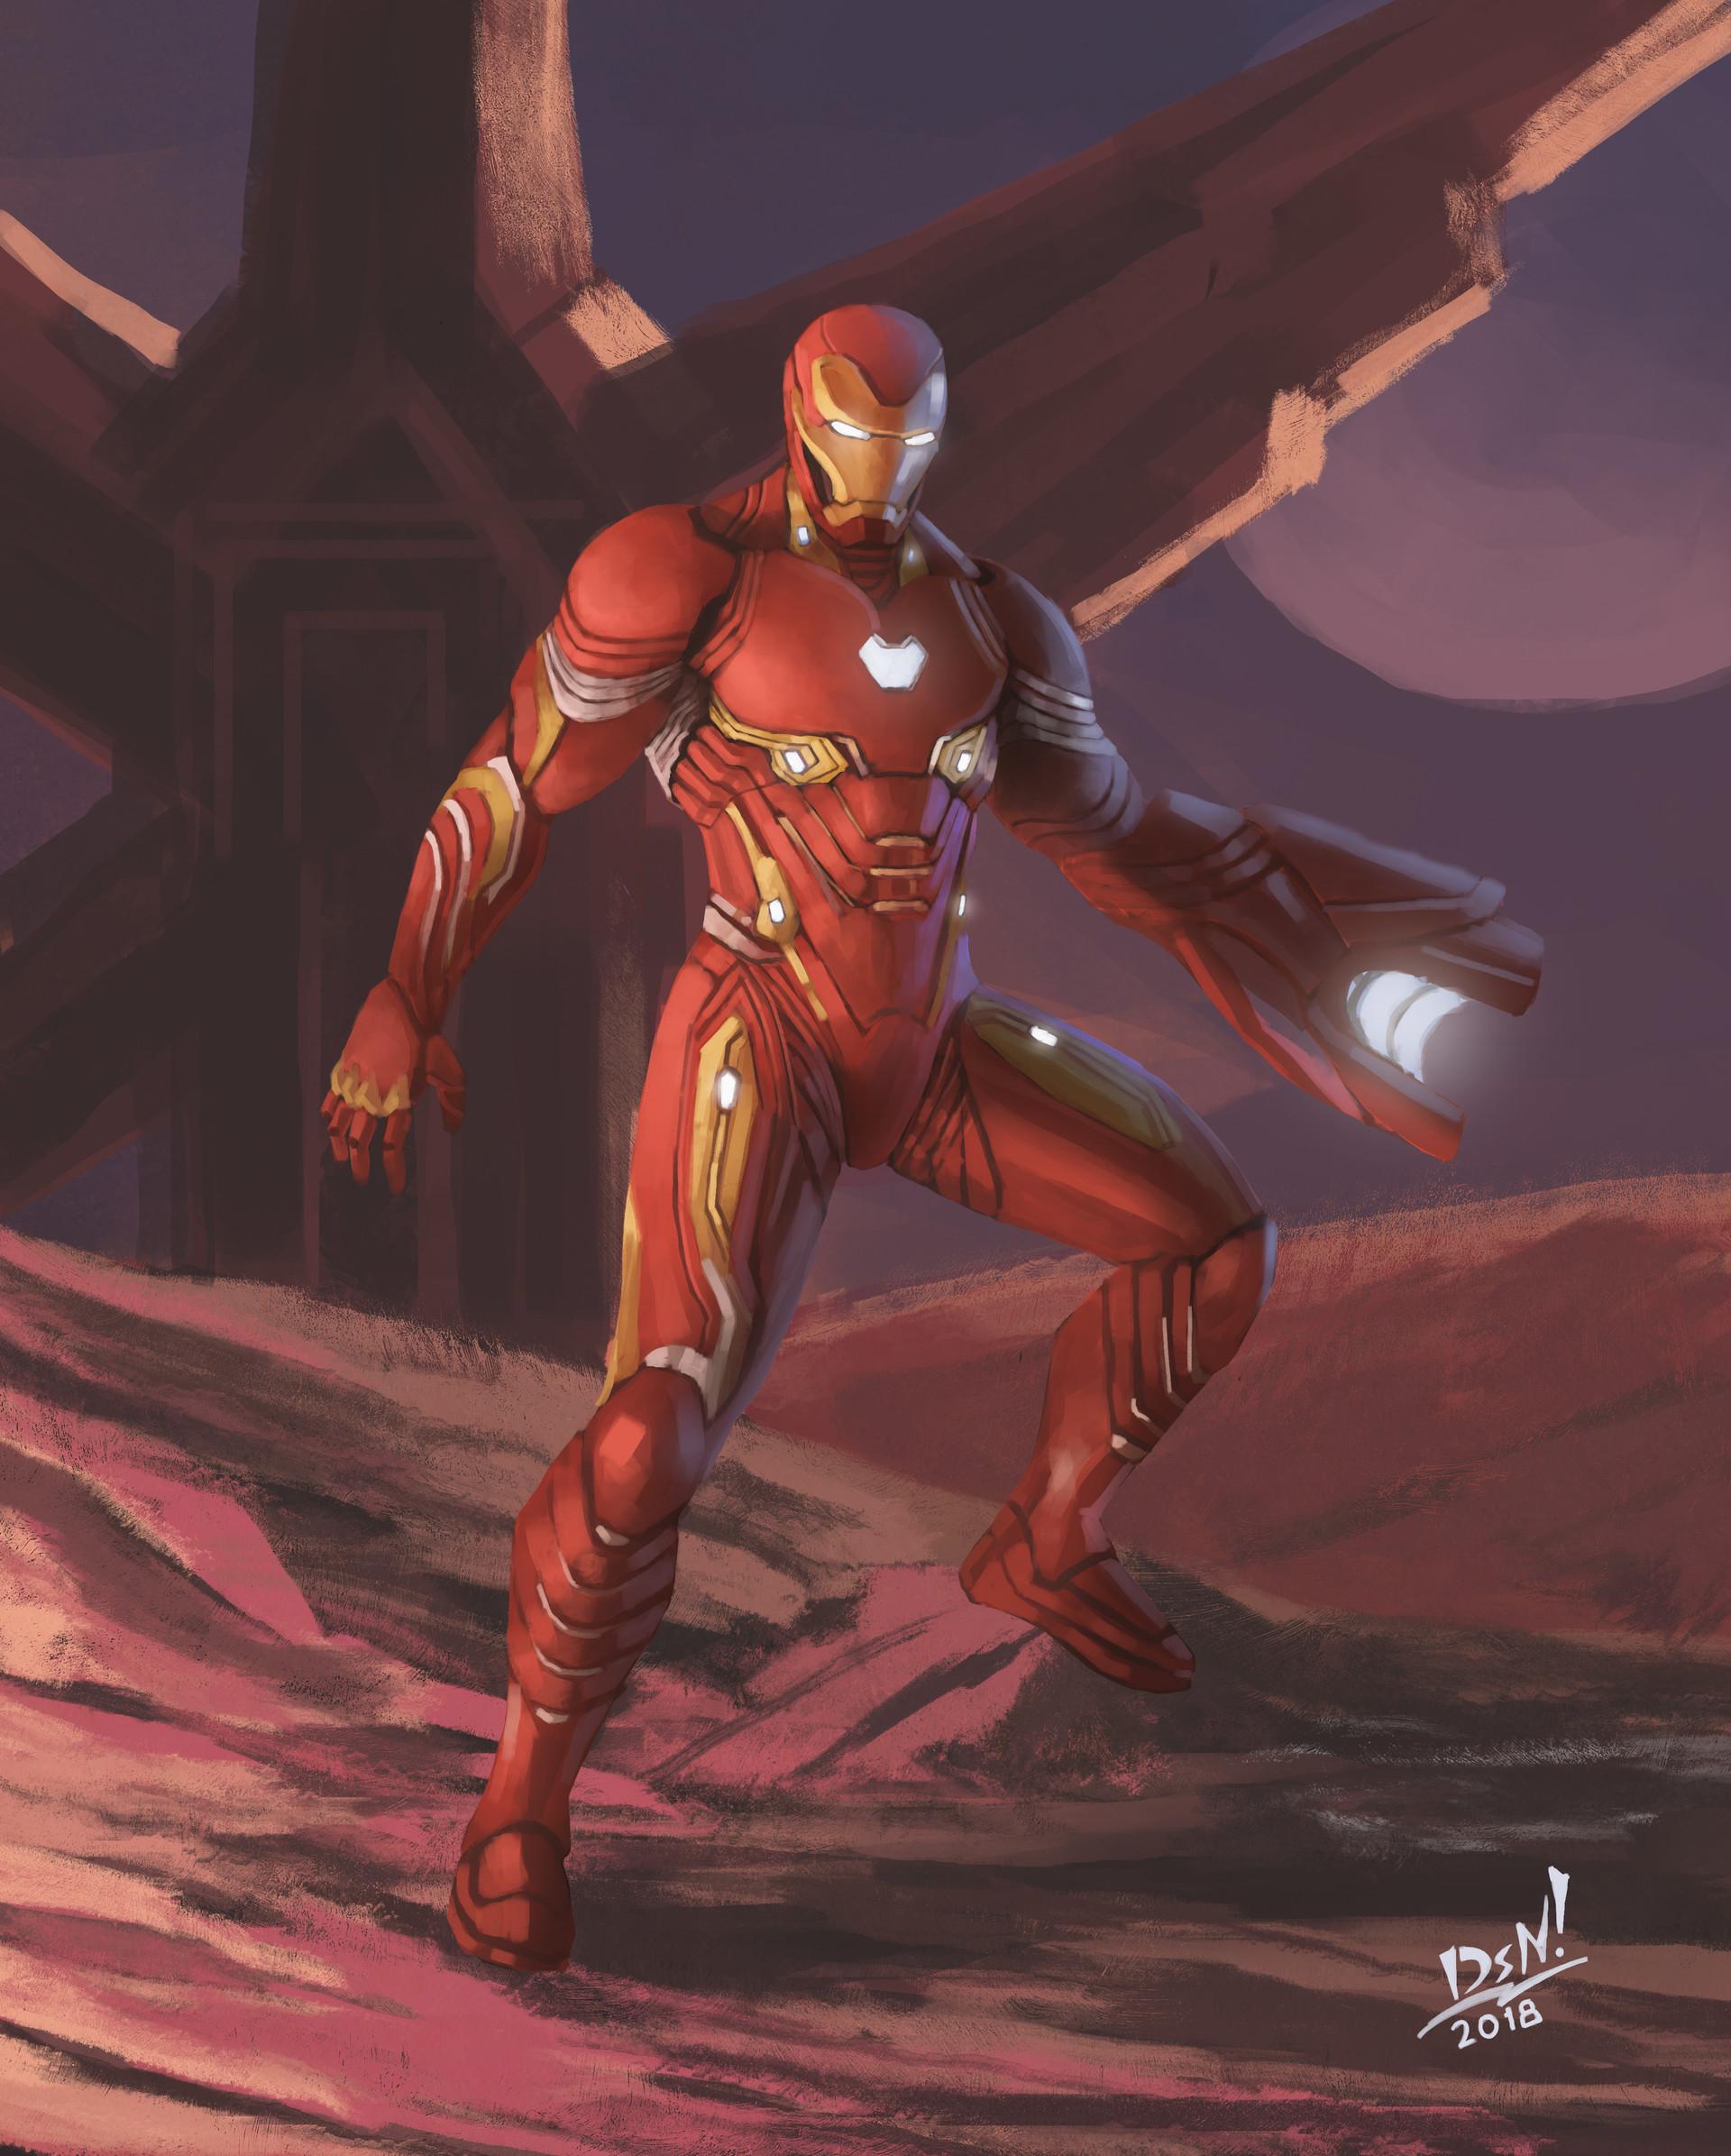 ArtStation - Iron Man nanosuit (Fan Art), Dastan Tebegen